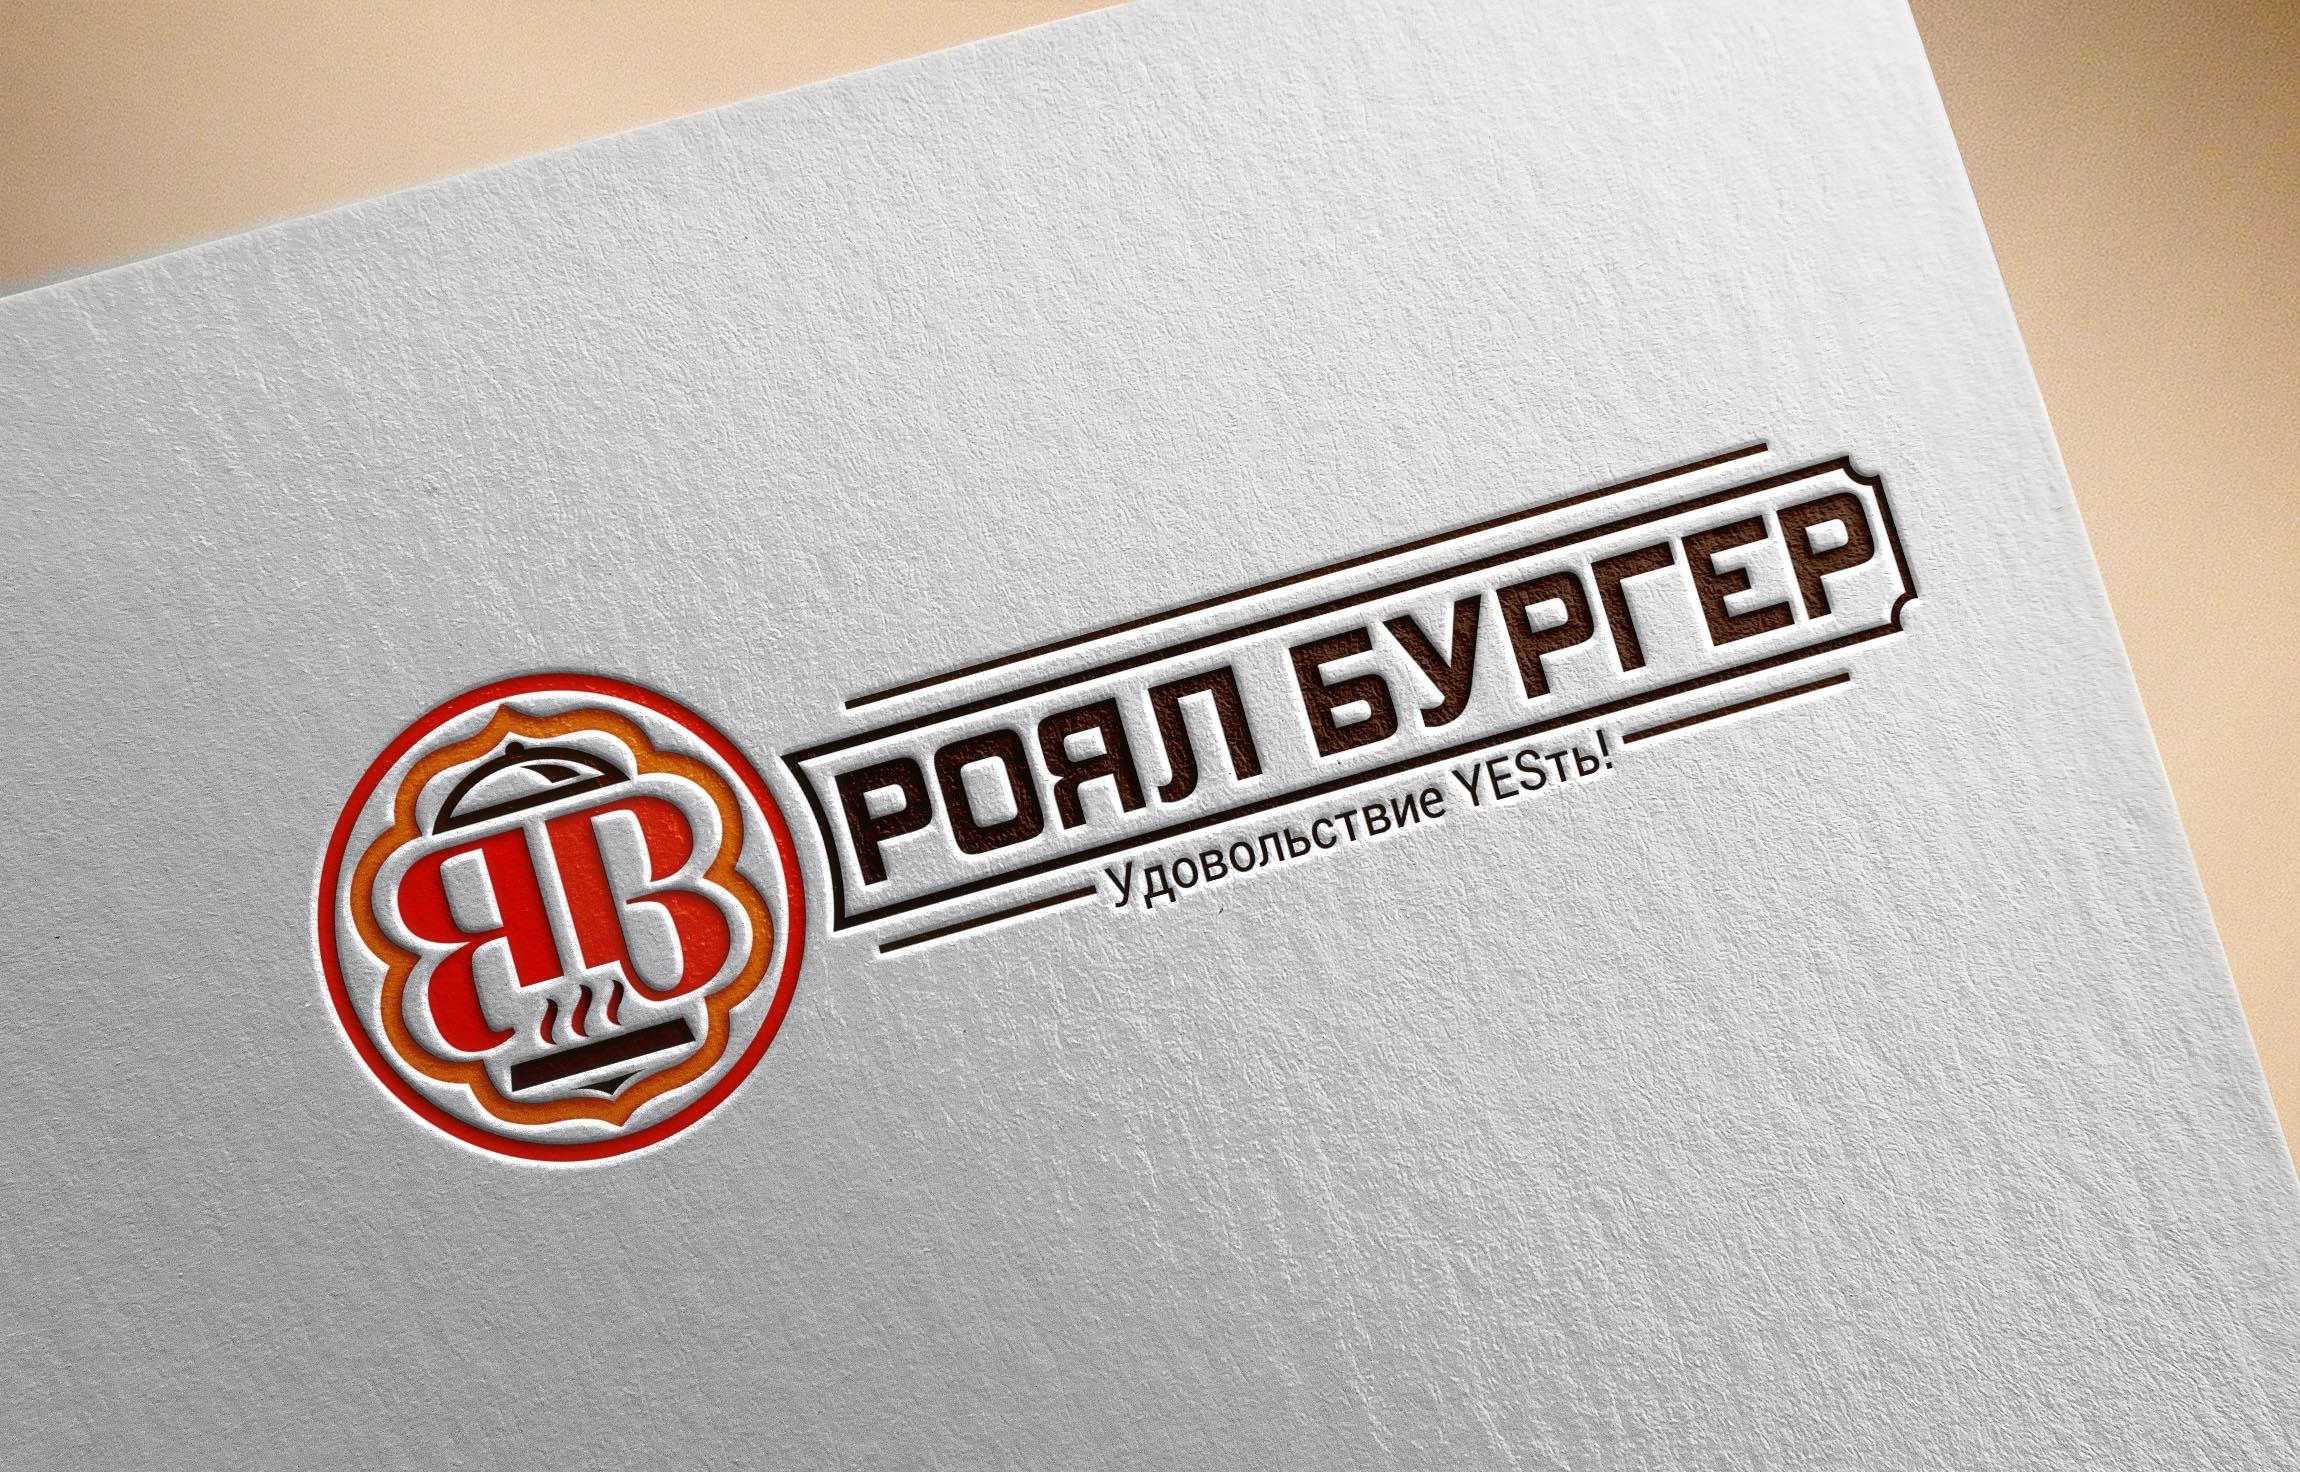 Обновление логотипа фото f_85859c96d6737697.jpg